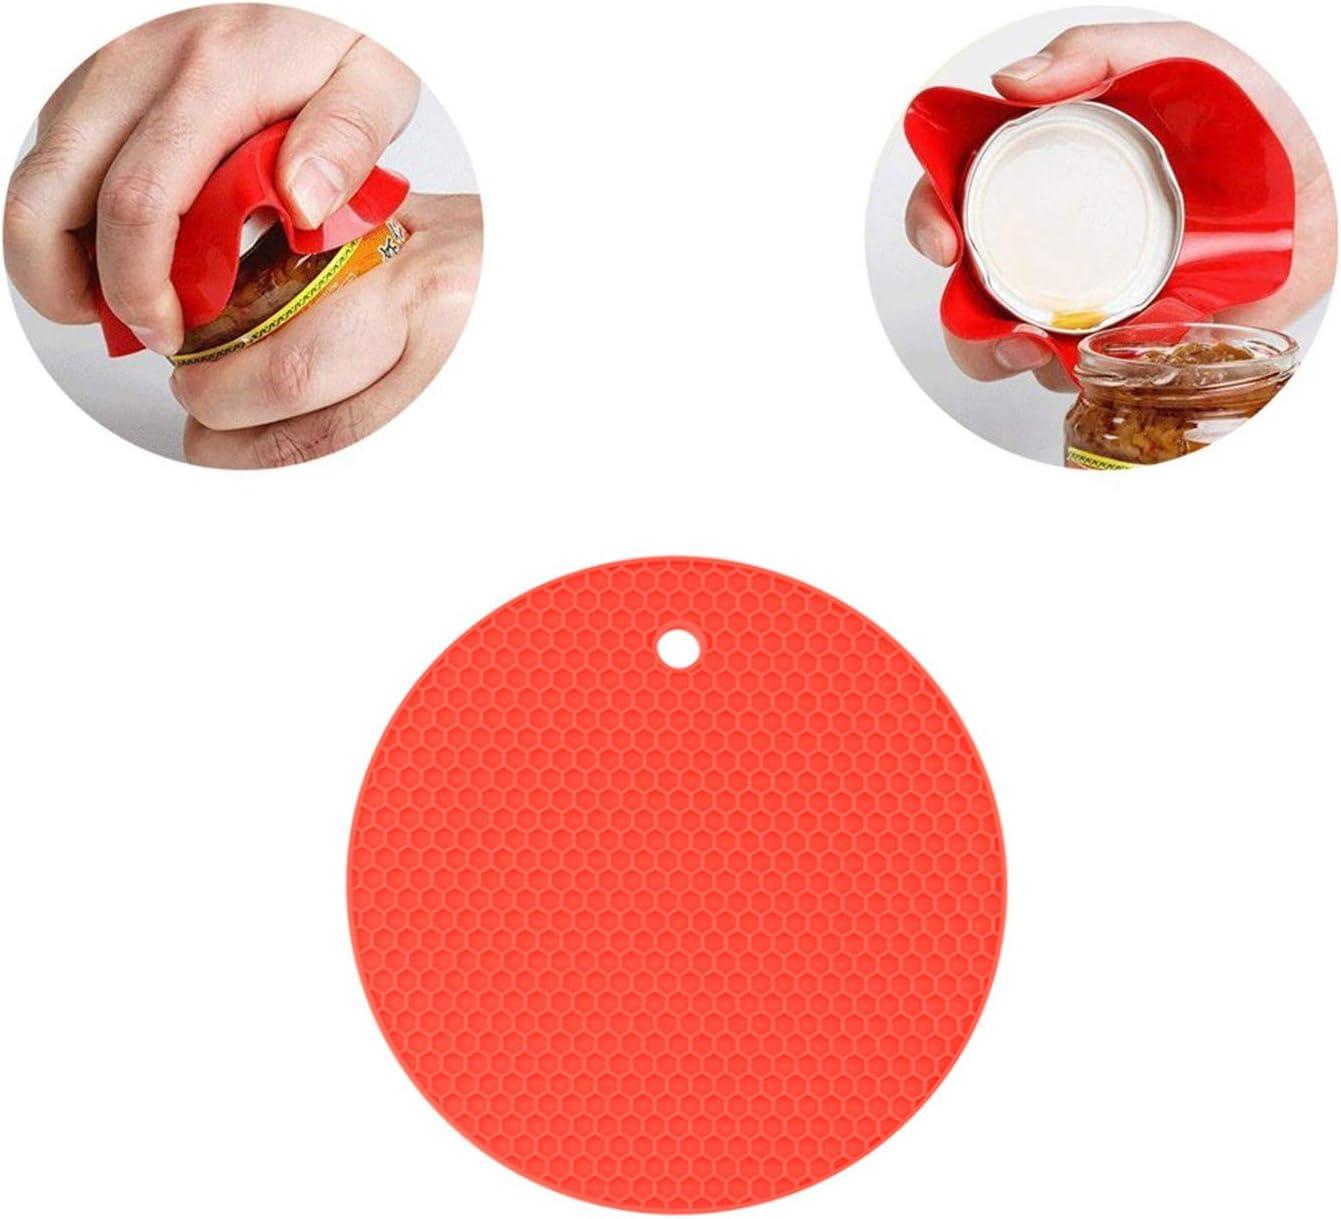 Senior Arthritis Hands Jar Grip Opener Bottle Opener Set of 3,Multi Kitchen Tools Set,Rubber Jar,Non Slip Gripper Pad,Jar Openers Get Lids Off Easily for Weak